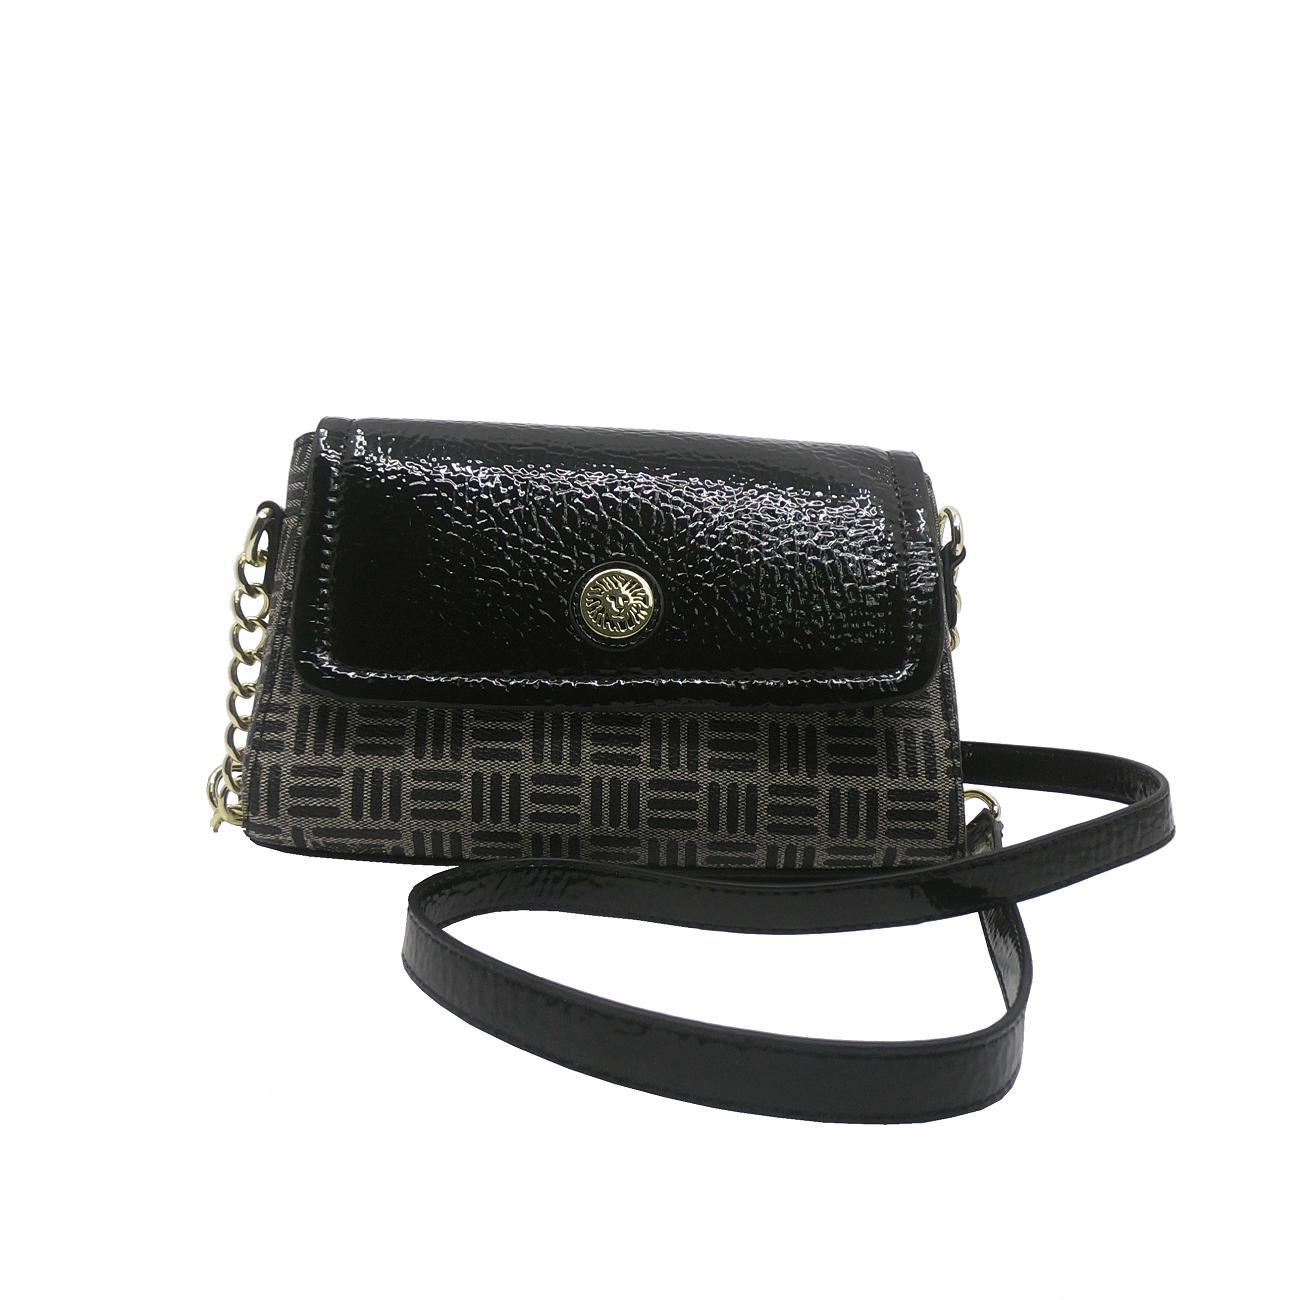 6b7a5f5d04935 Womens Cross Body Bags for sale - Sling Bags for Women Online Deals ...